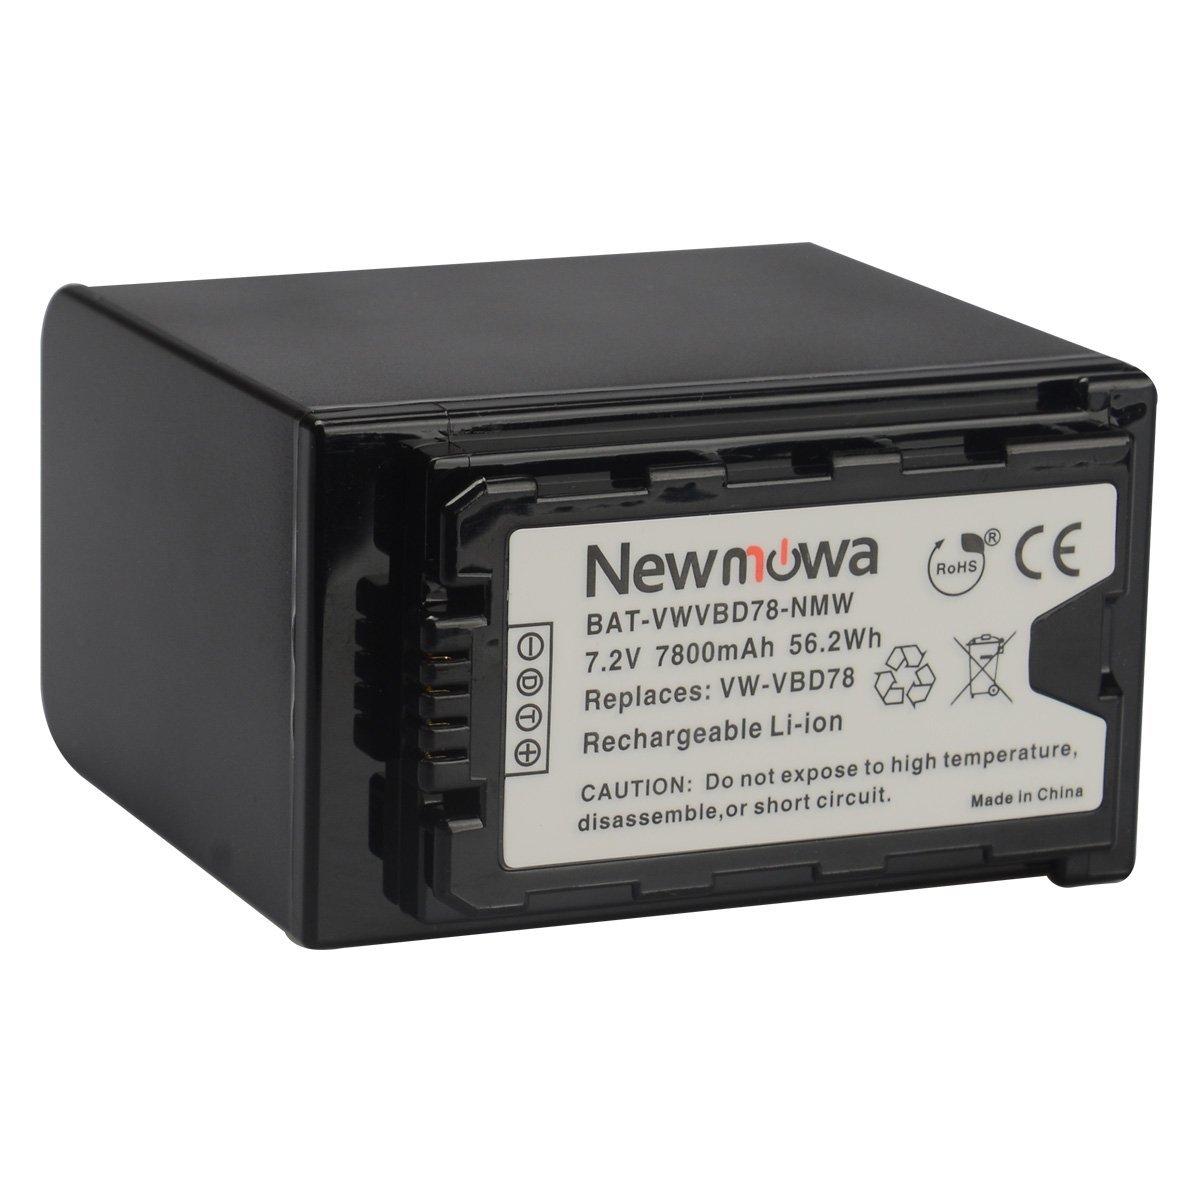 Newmowa VW-VBD78 Rechargeable Li-ion Battery for Panasonic VW-VBD58, VW-VBD78 and Panasonic AJ-PX270,AJ-PX298,AJ-PX298MC,HC-MDH2,HC-MDH2GK,HC-MDH2GK-K,HC-MDH2M,AG-FC100MC,AG-DVX200MC